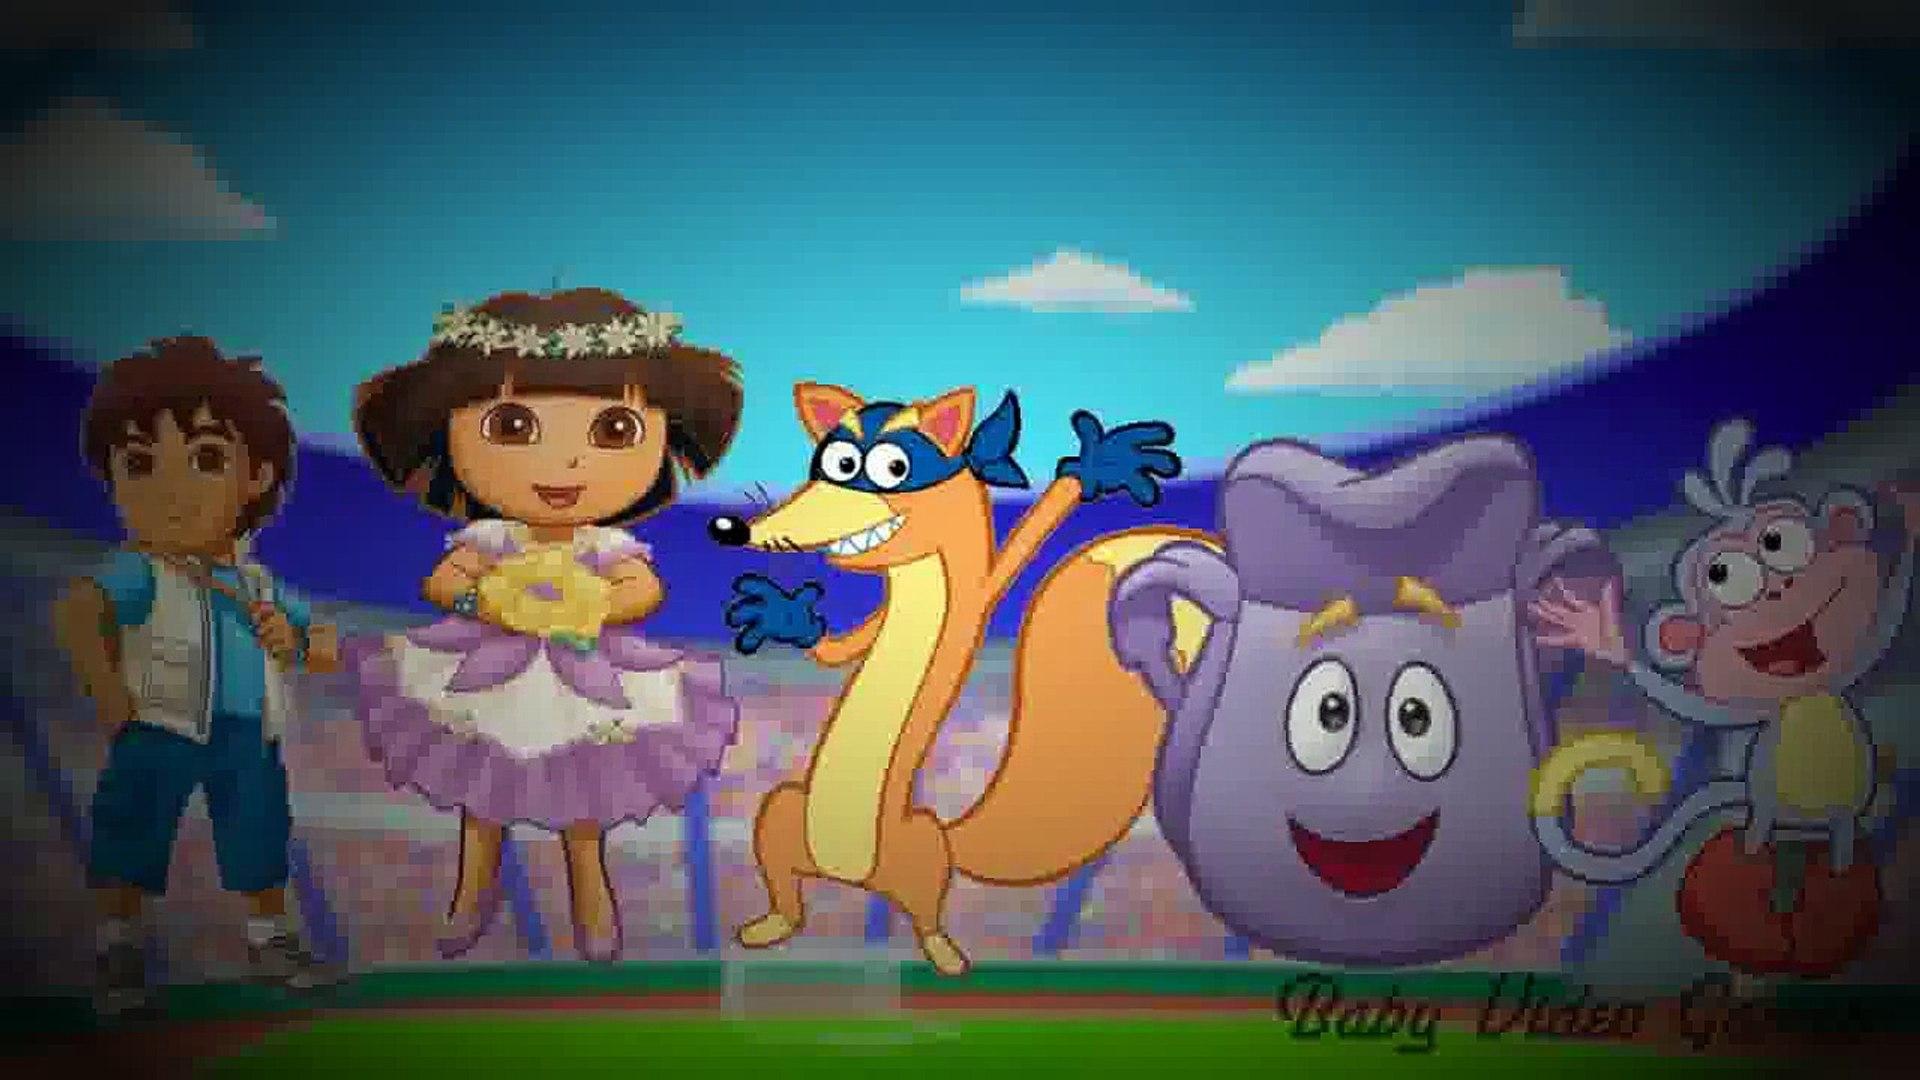 Ninja Turtles Cartoon Songs for Kids Children Education Animated Cartoons